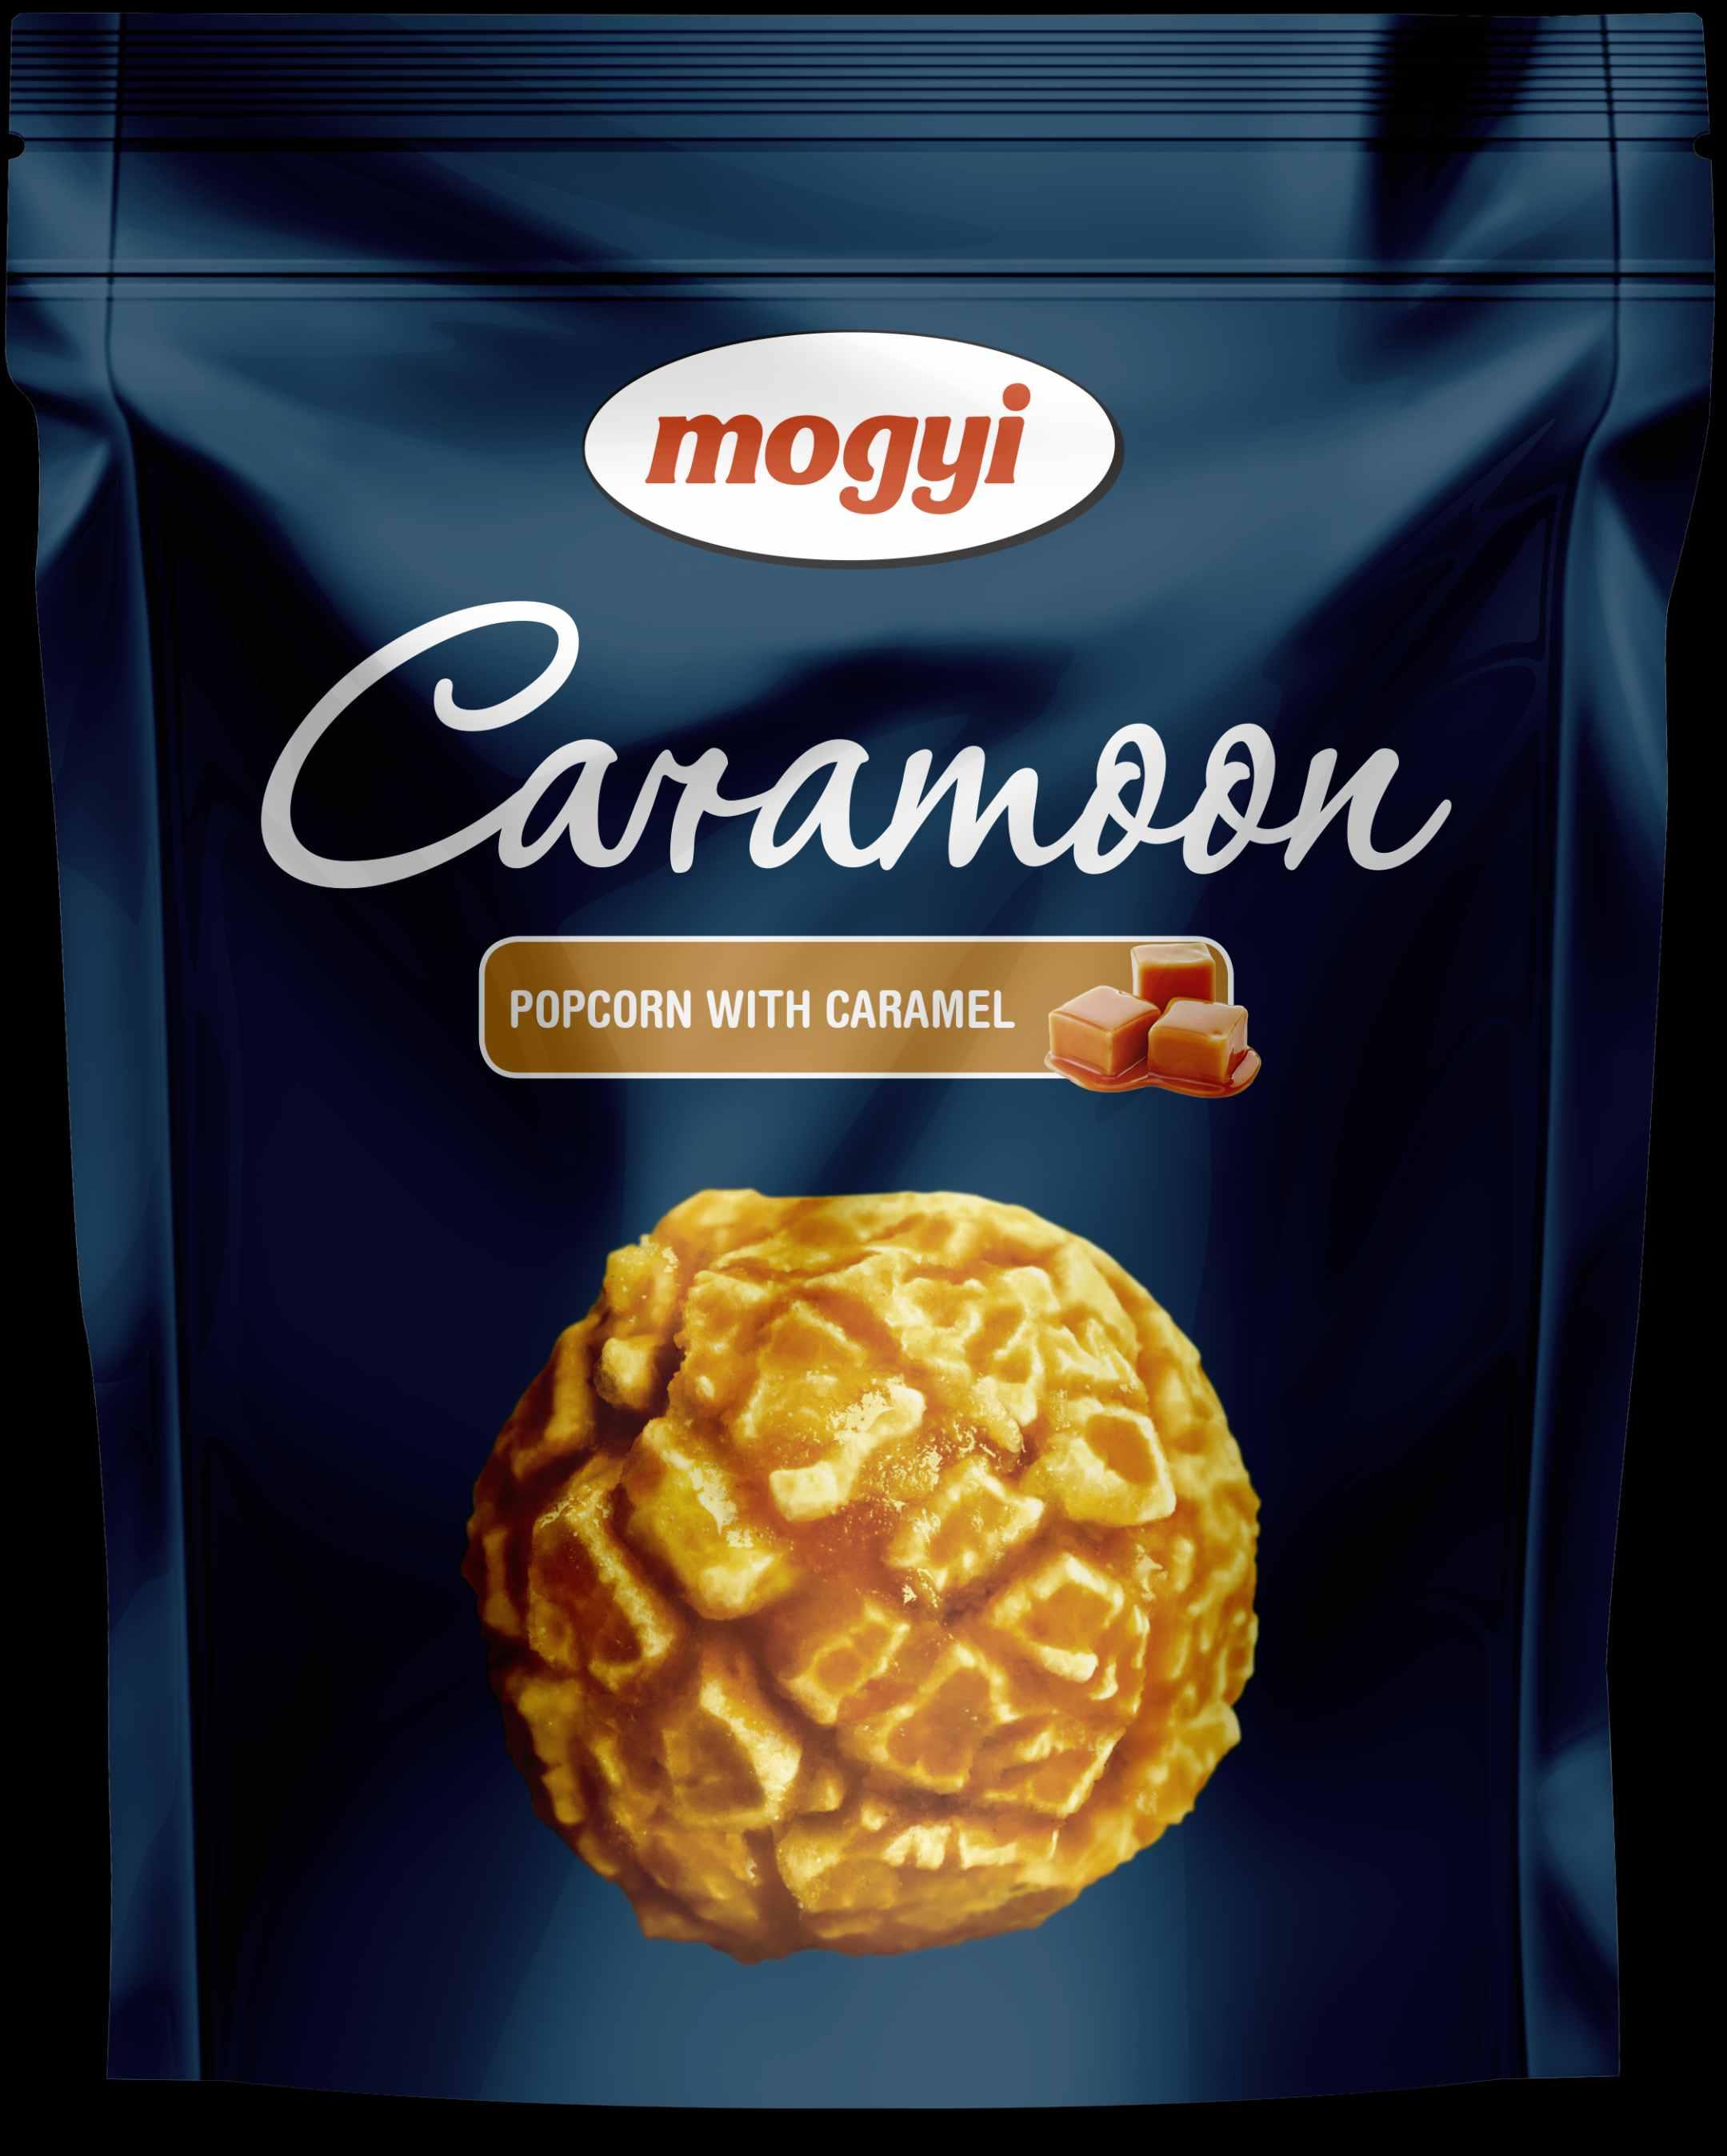 mogyi_caramoon_karamell.jpg